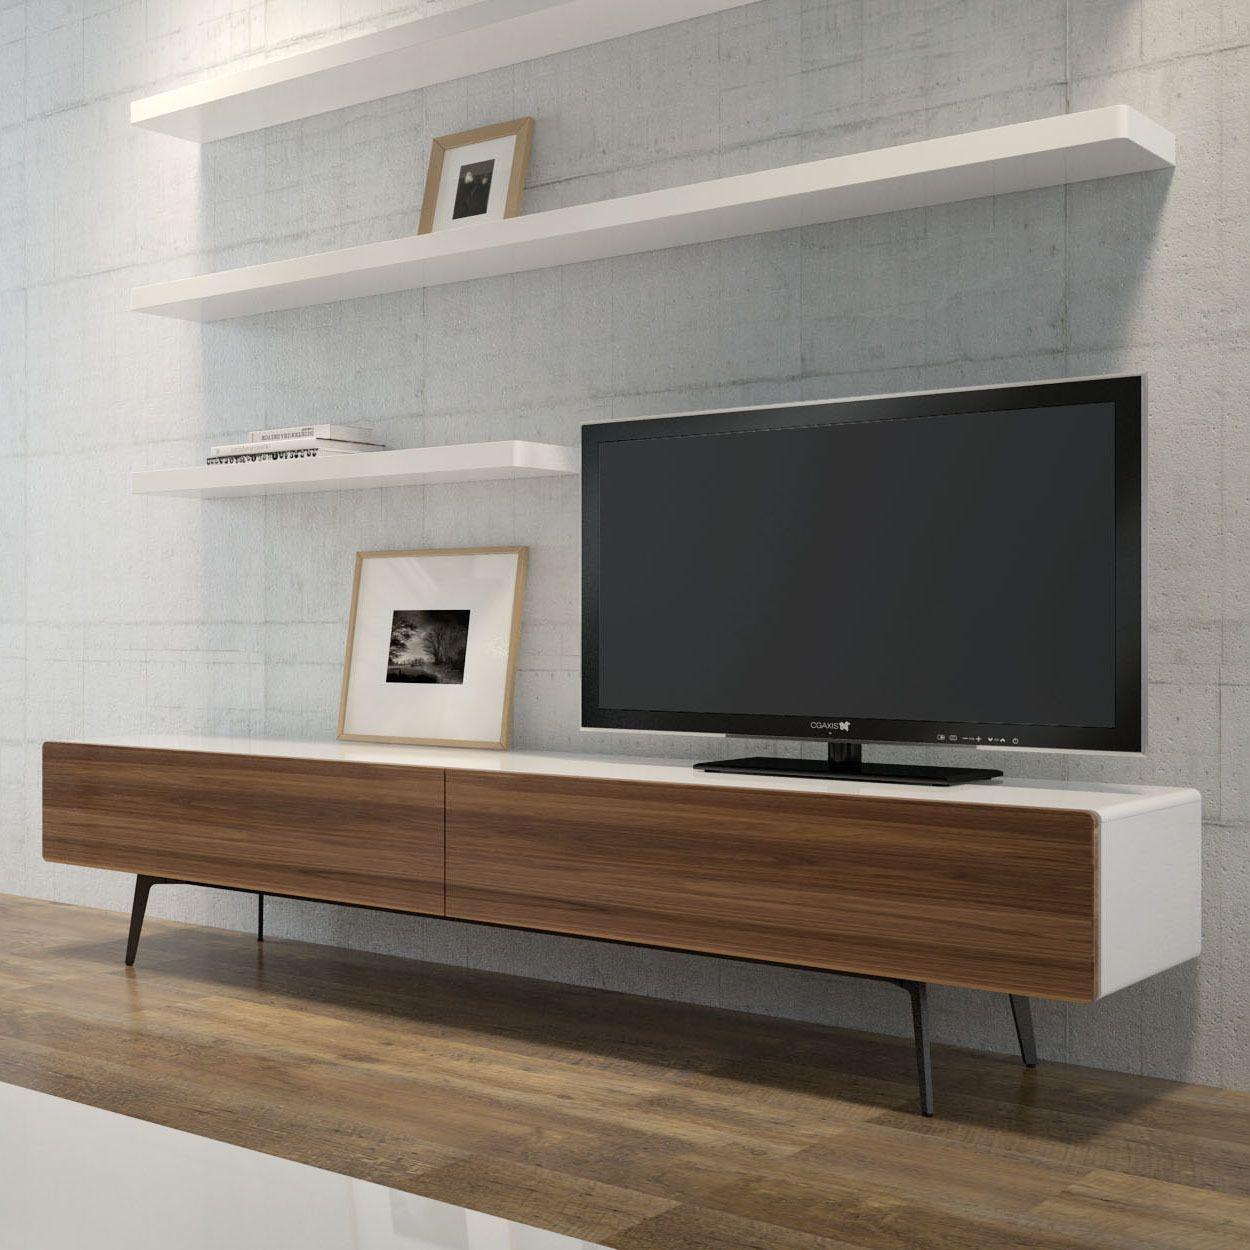 CitySide Furniture brings you a range of